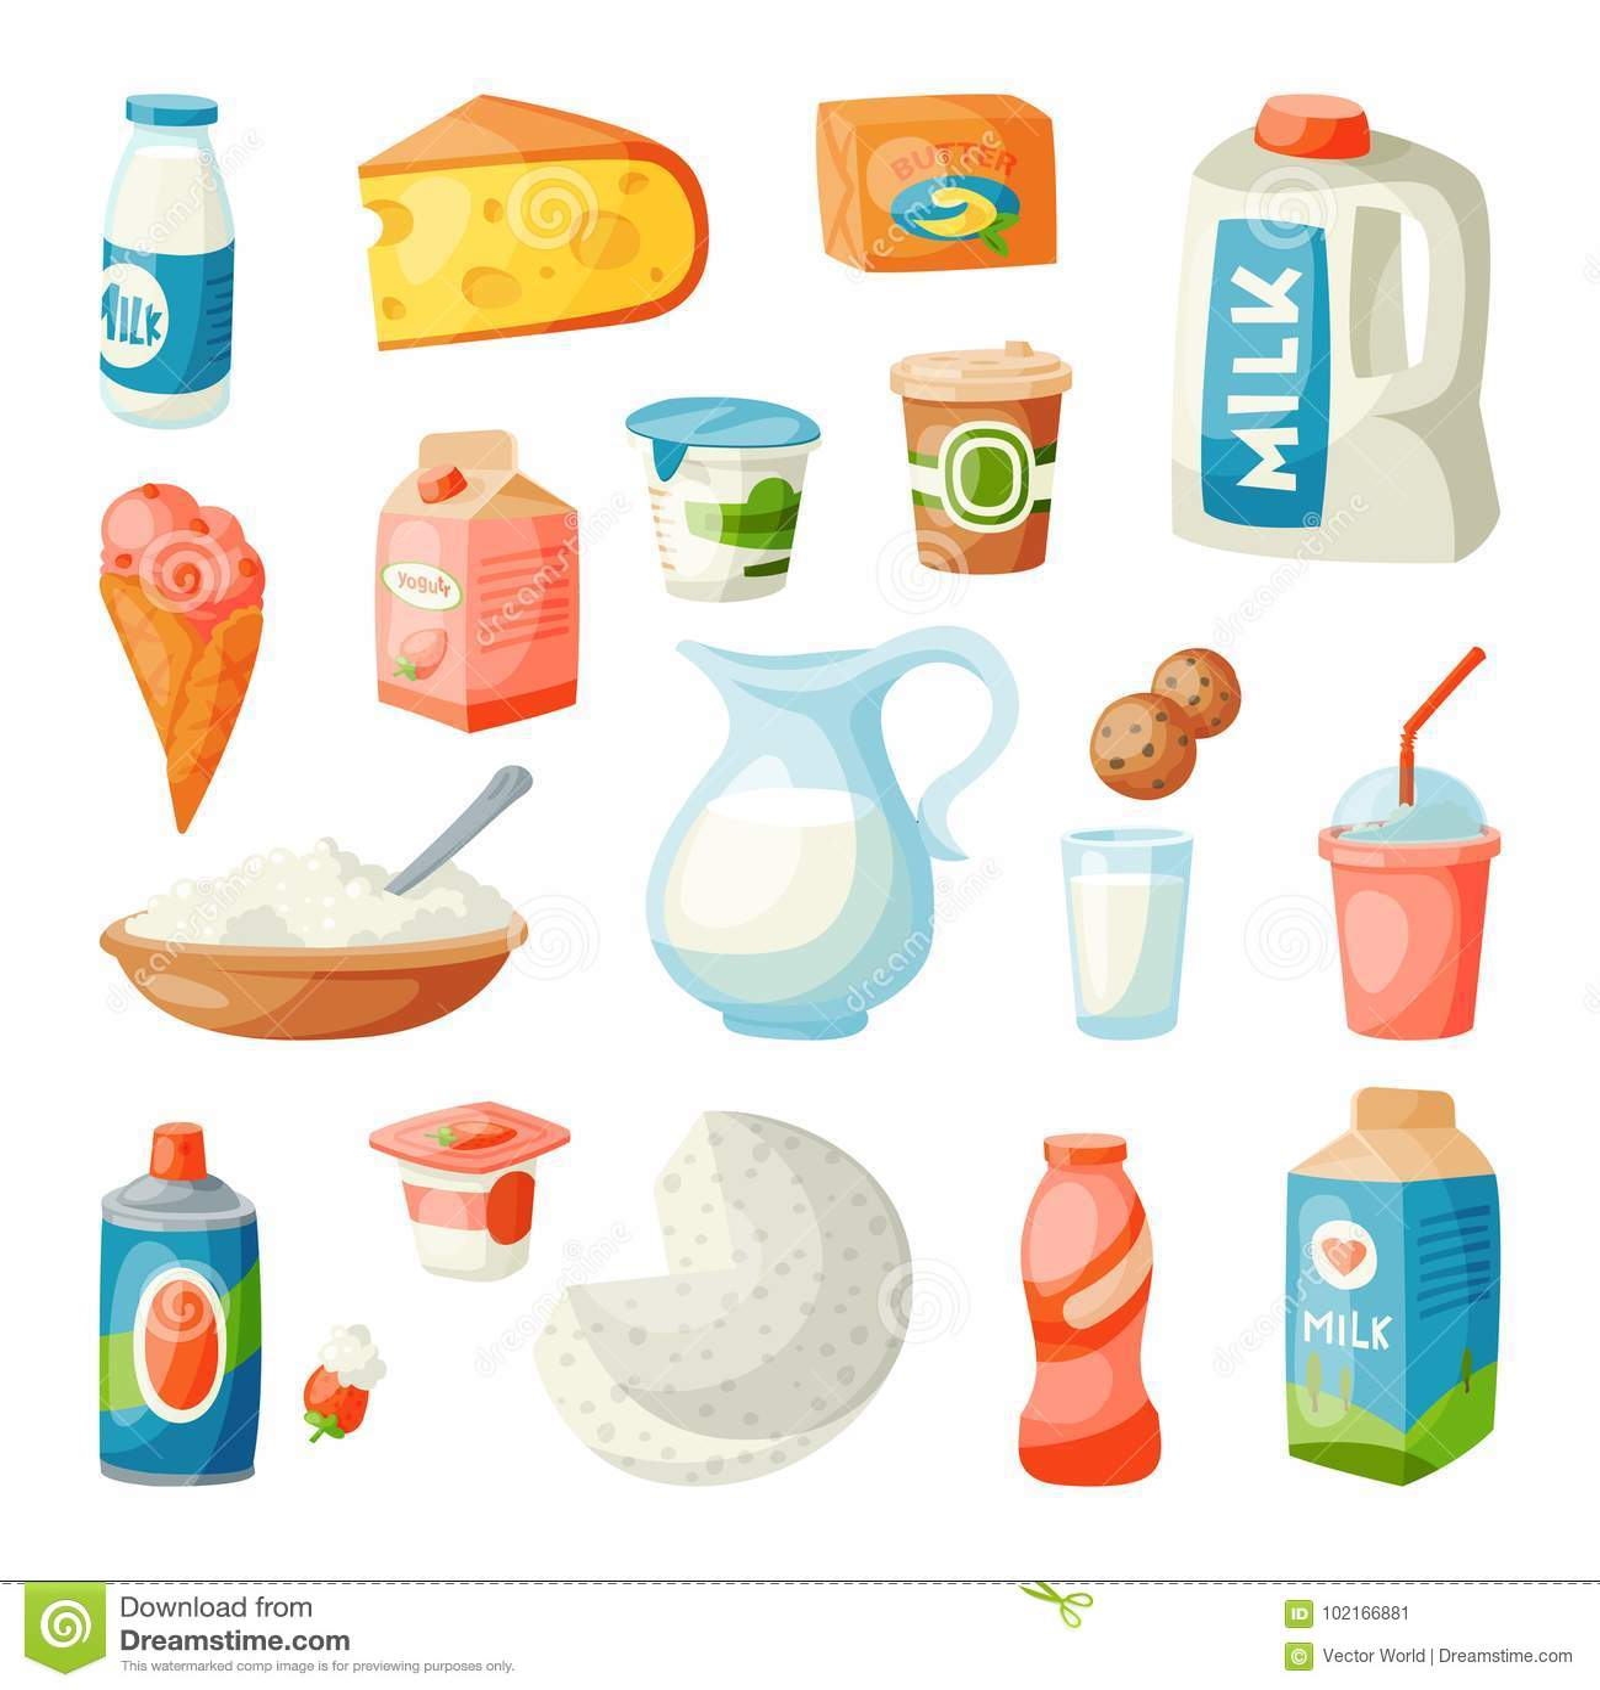 Milk dairy products in flat style breakfast gourmet organic meal fresh diet food milky drink ingredient nutrition vector